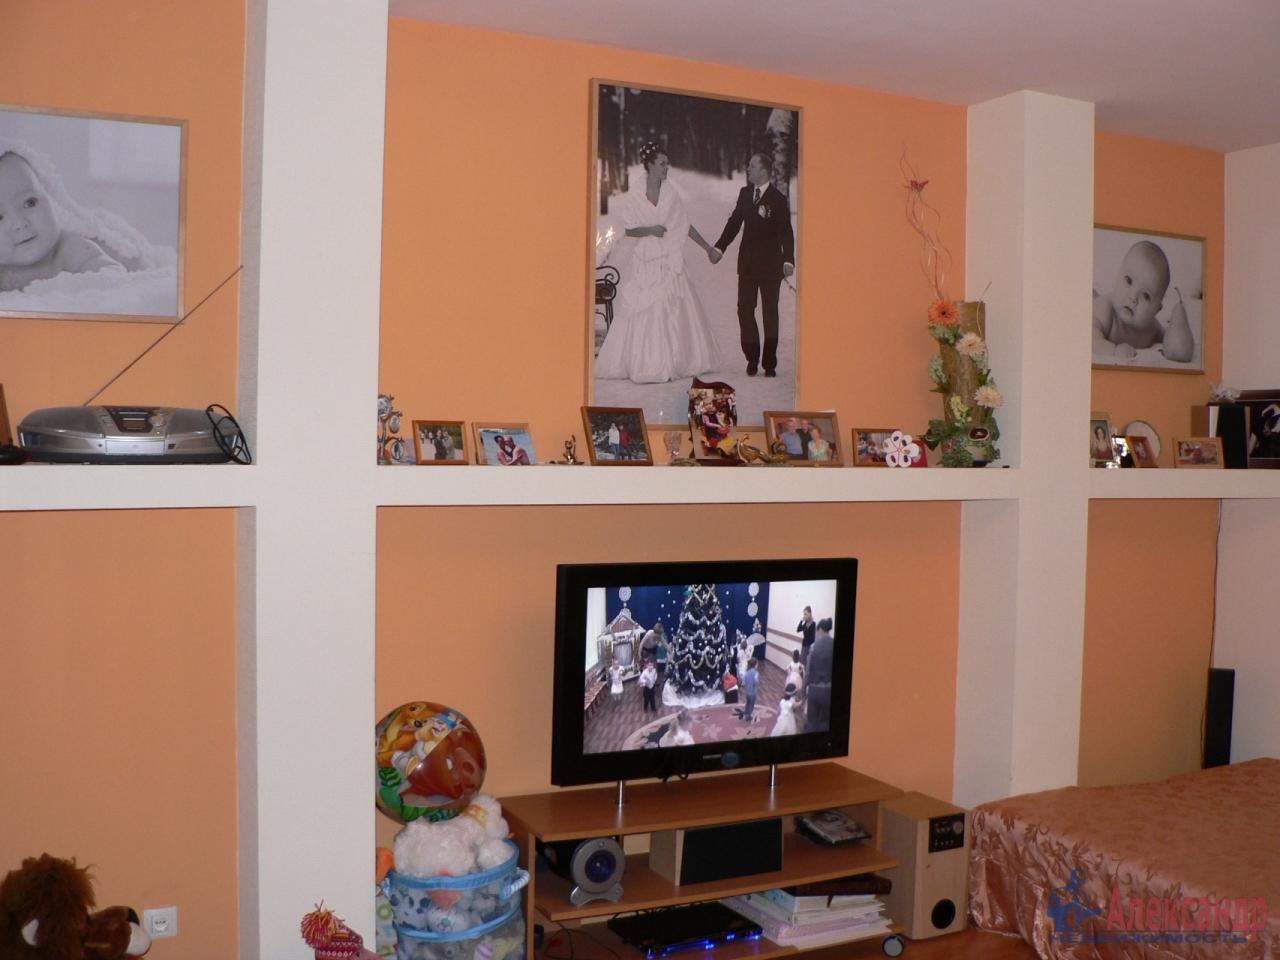 1-комнатная квартира (35м2) в аренду по адресу Тихорецкий пр., 12— фото 4 из 4